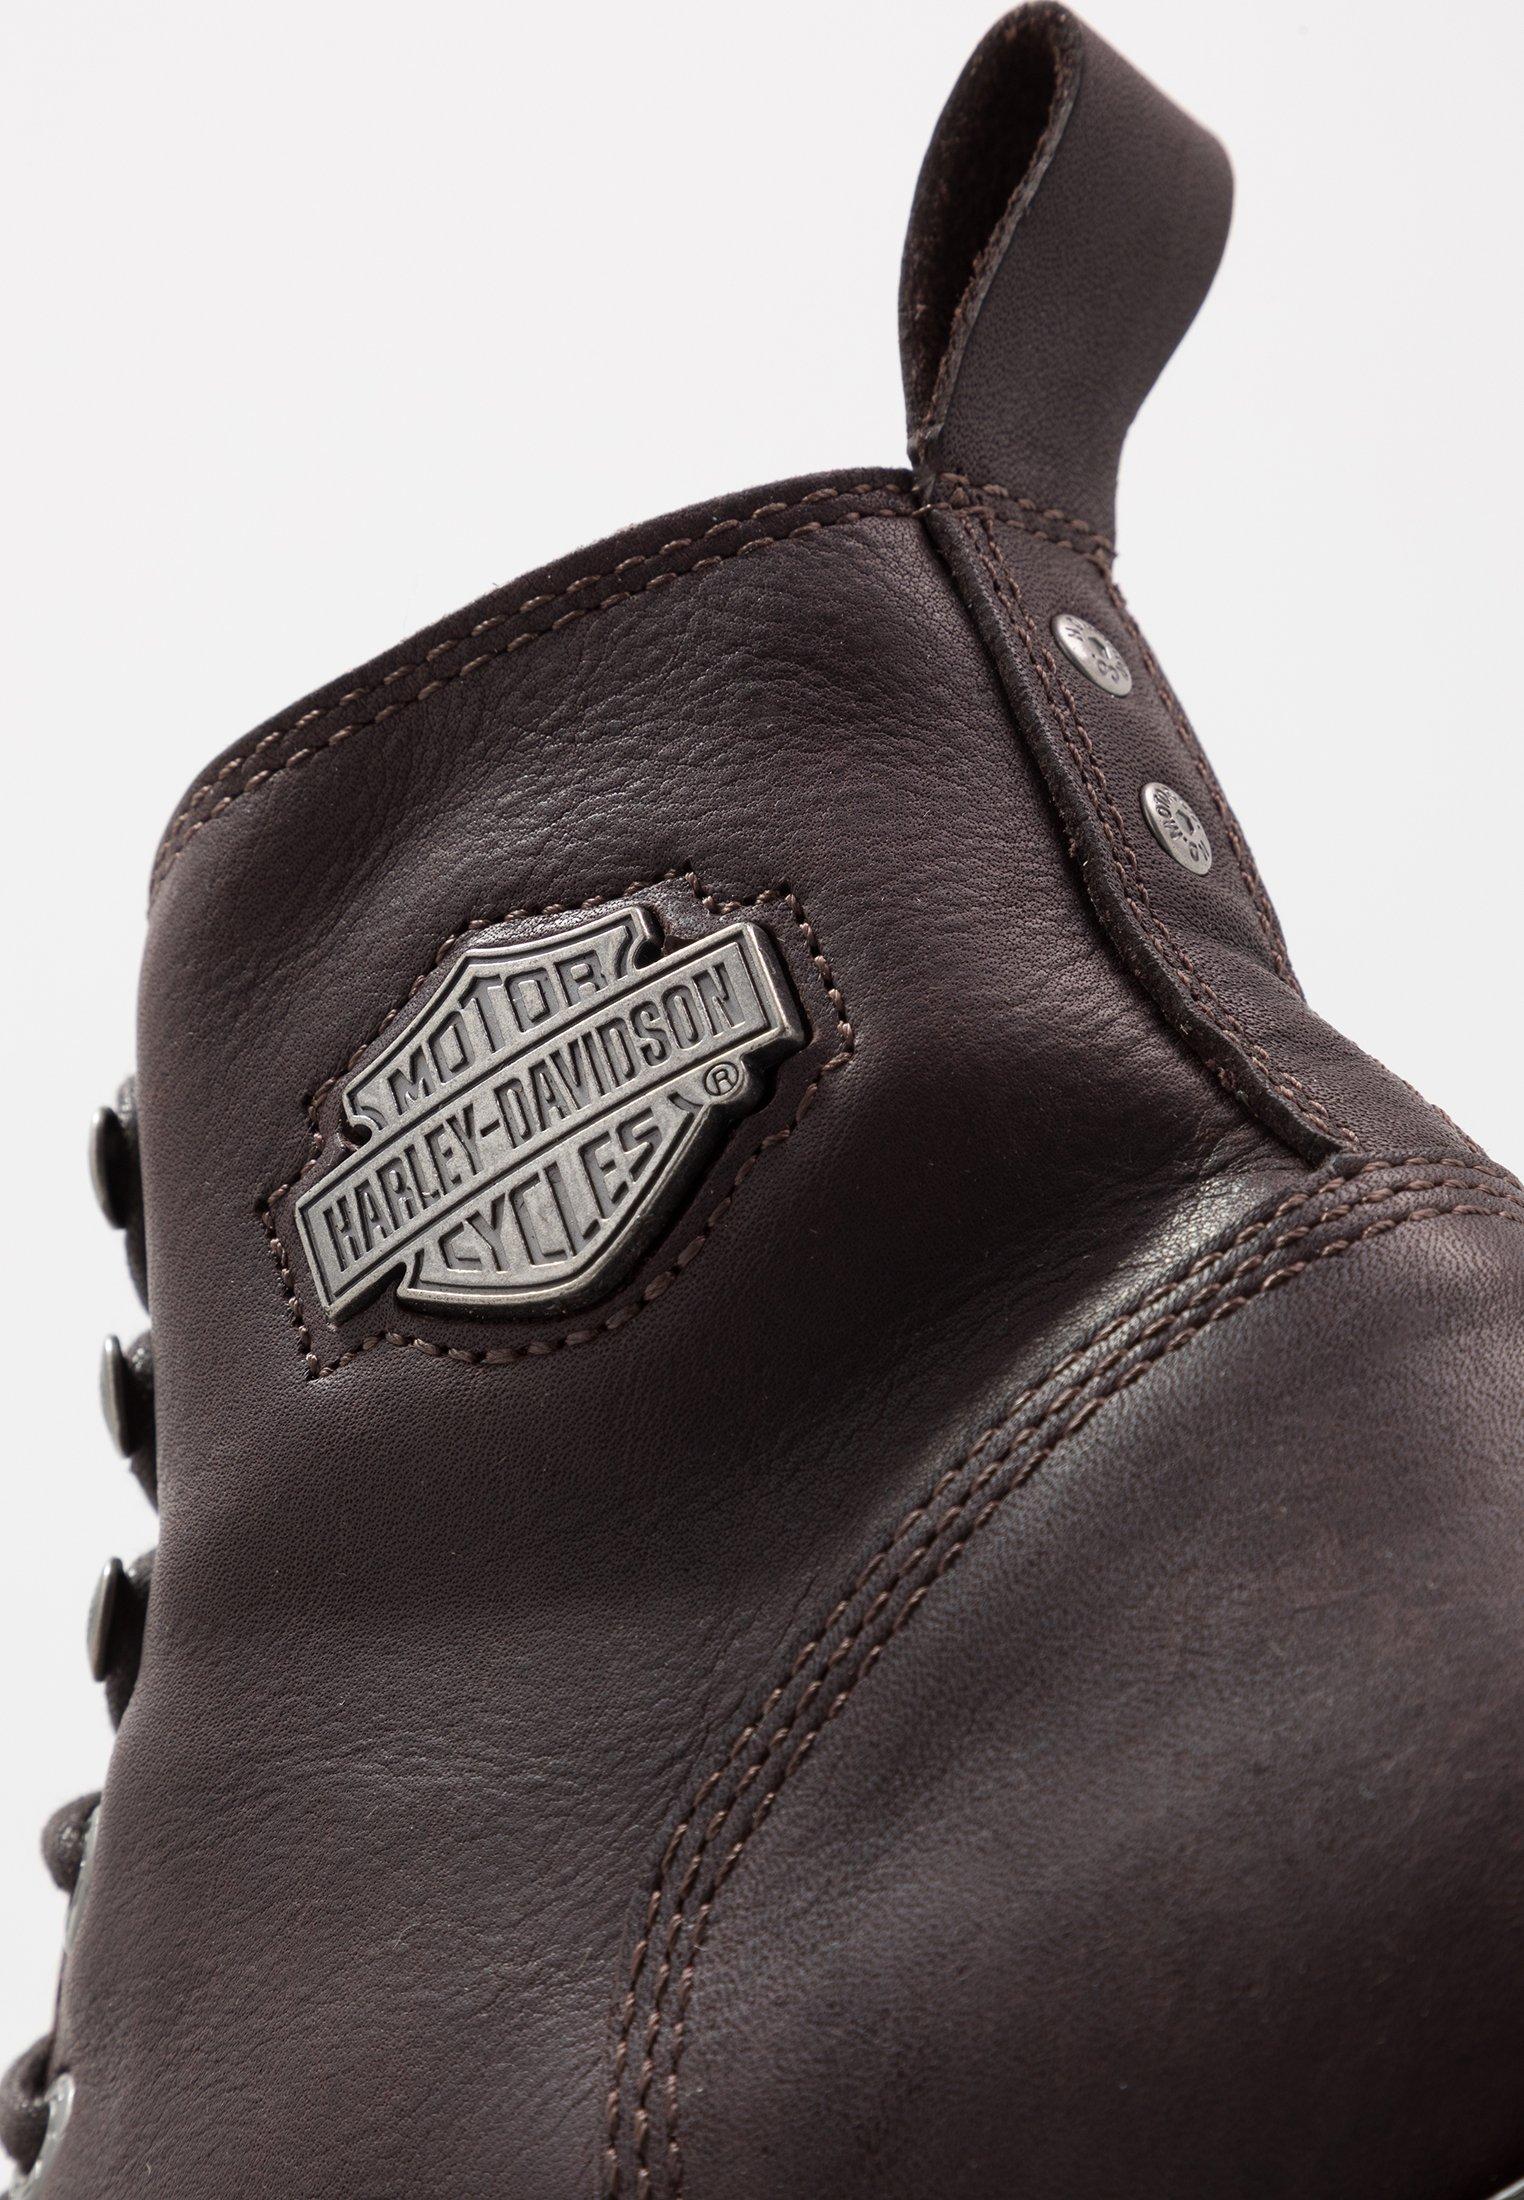 Harley Davidson WILLARD - Botki sznurowane - porter